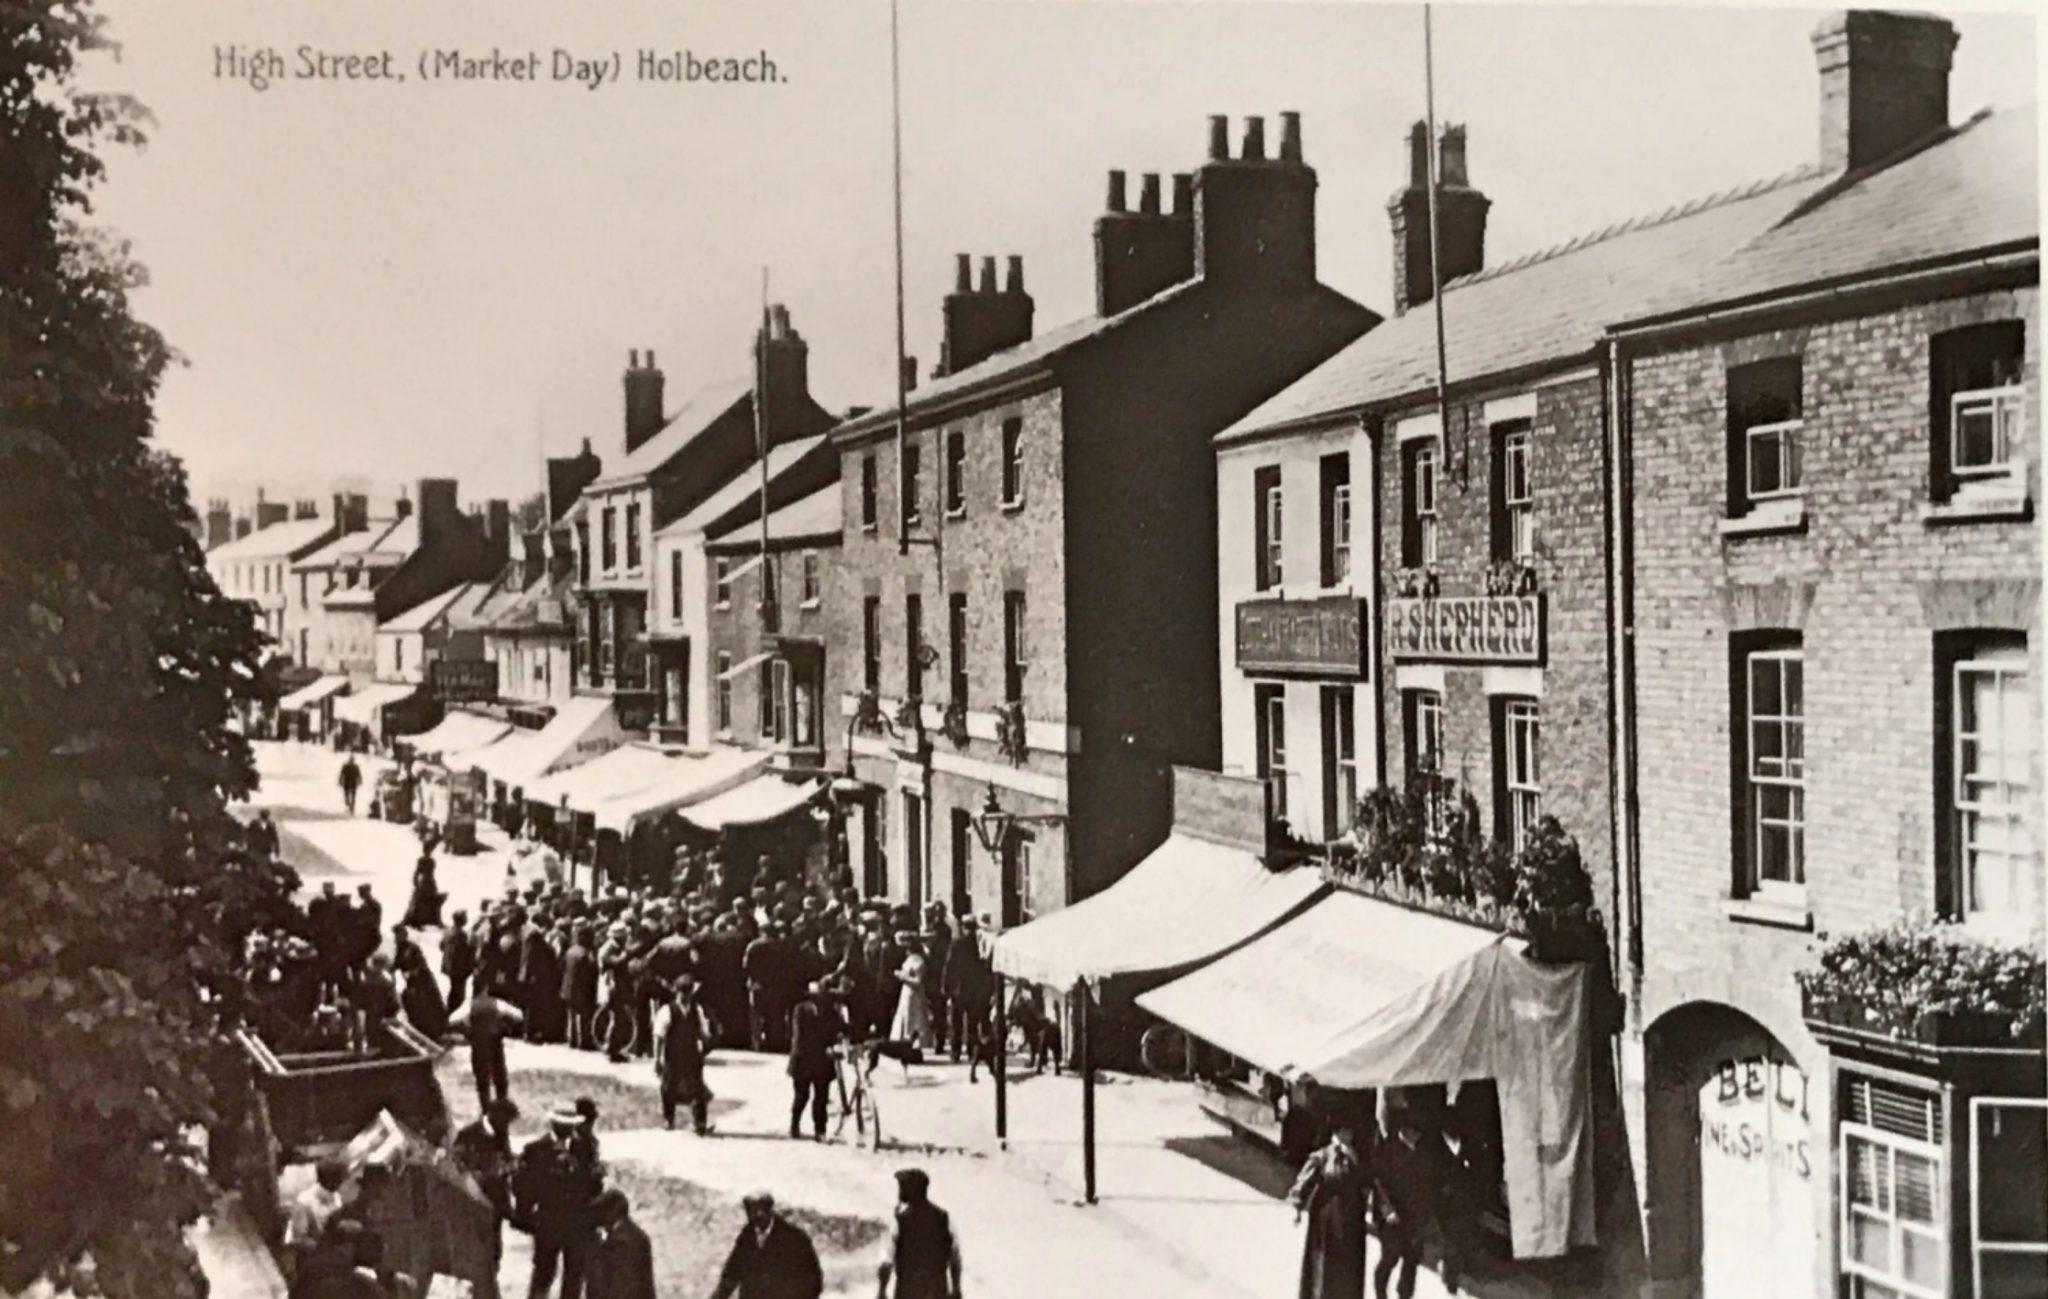 High St. on Market Day, Holbeach